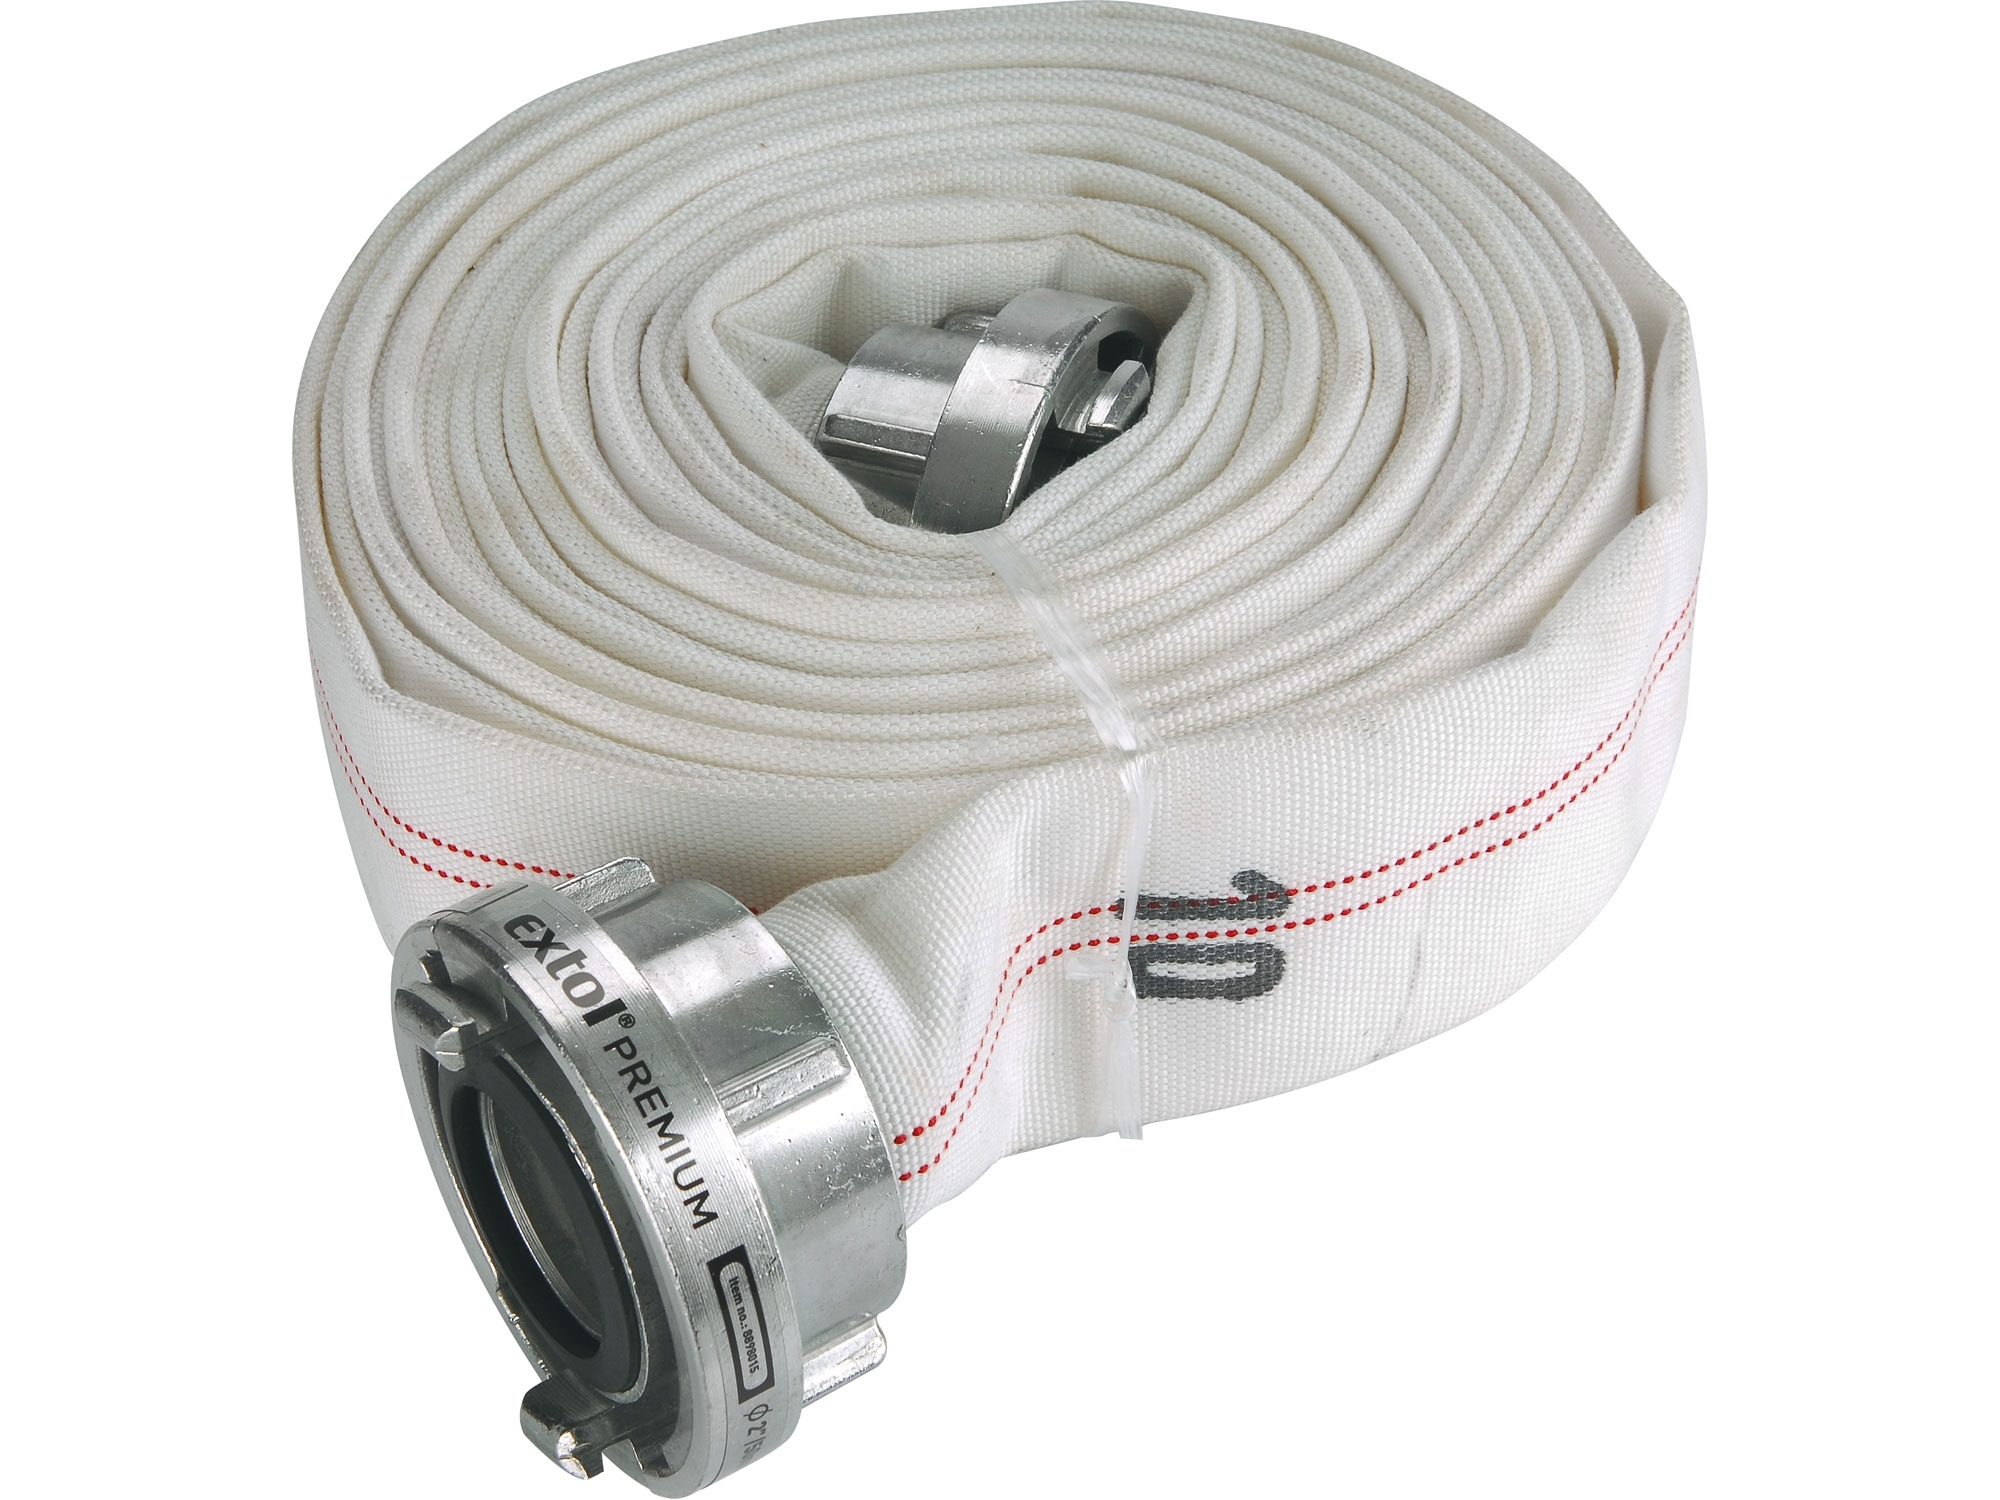 "hadice C52, 10m se spojkami, PVC, oplet PES, 2"" (50mm), 10m, EXTOL PREMIUM 8898015"